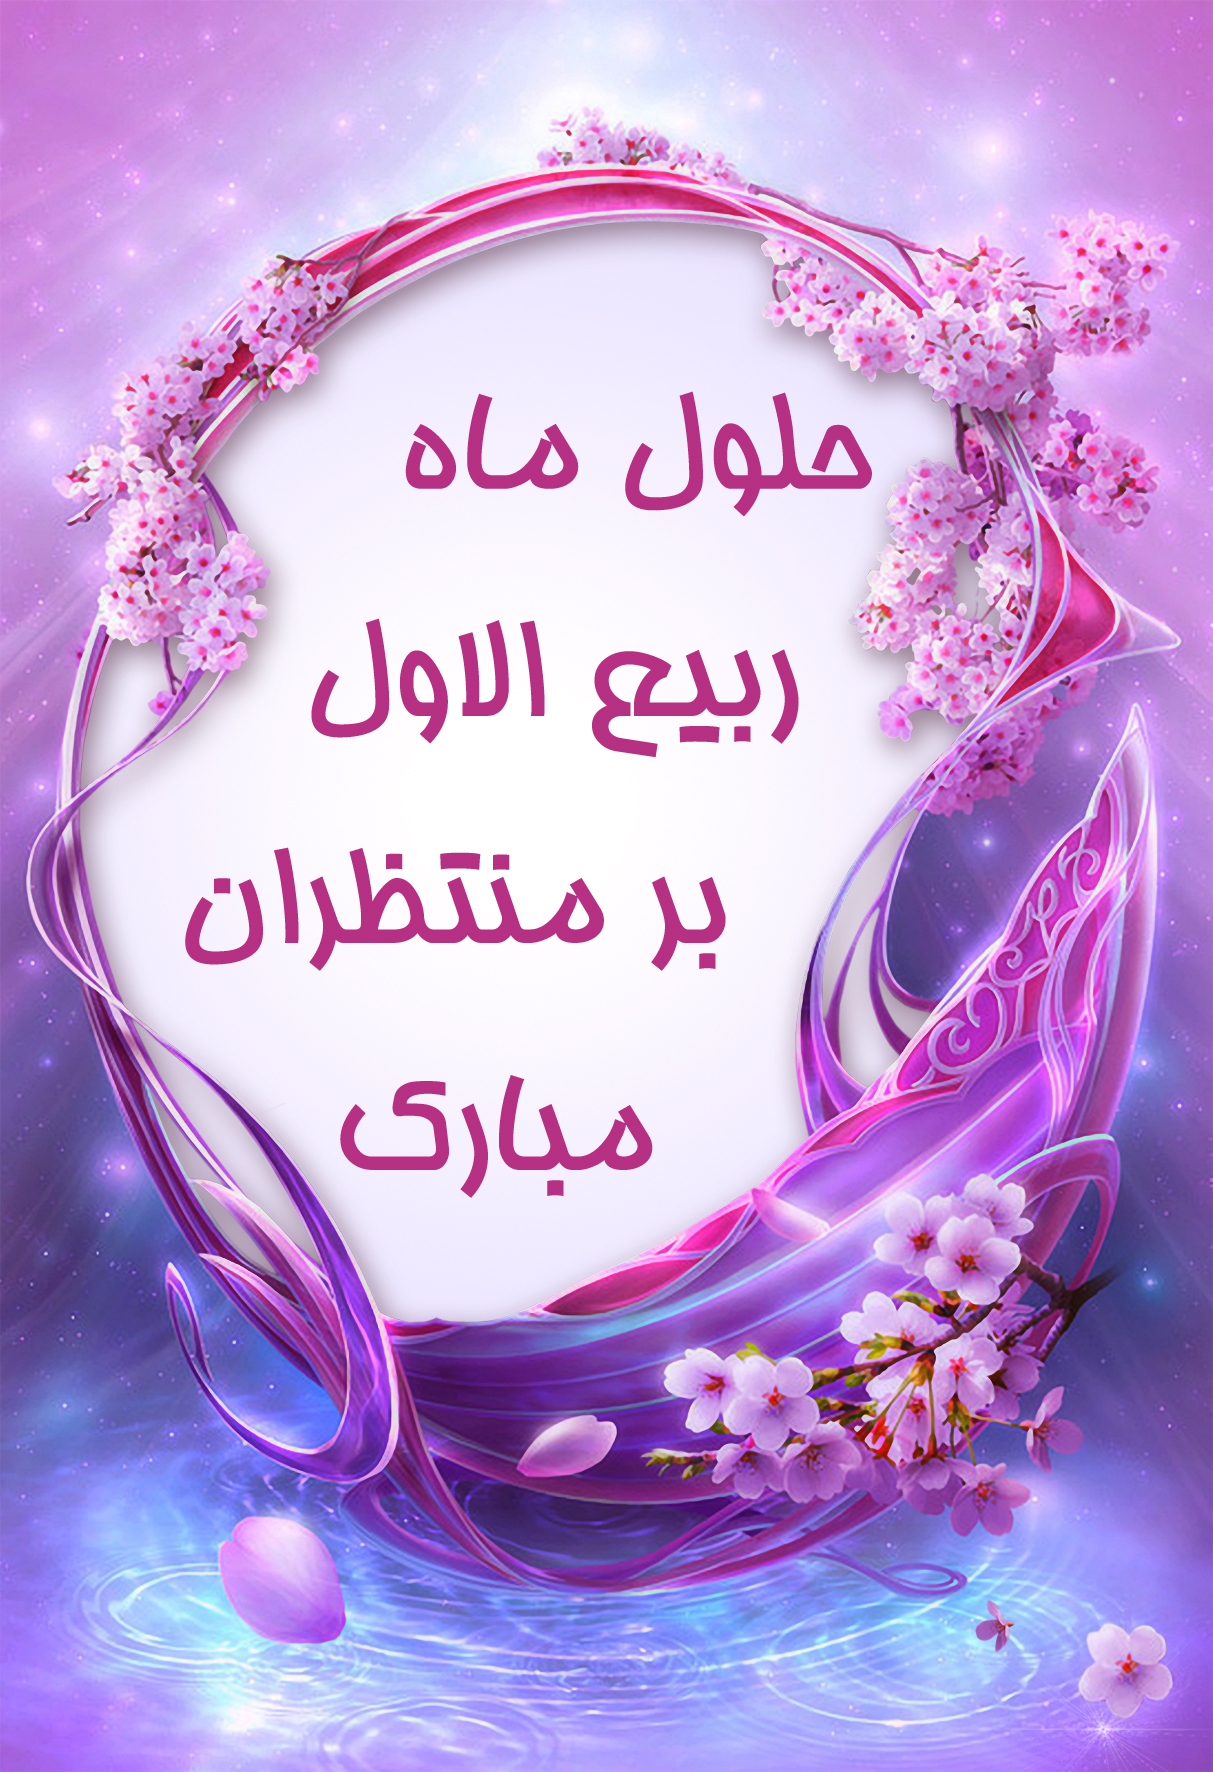 Image result for ماه ربیع الاول مبارک